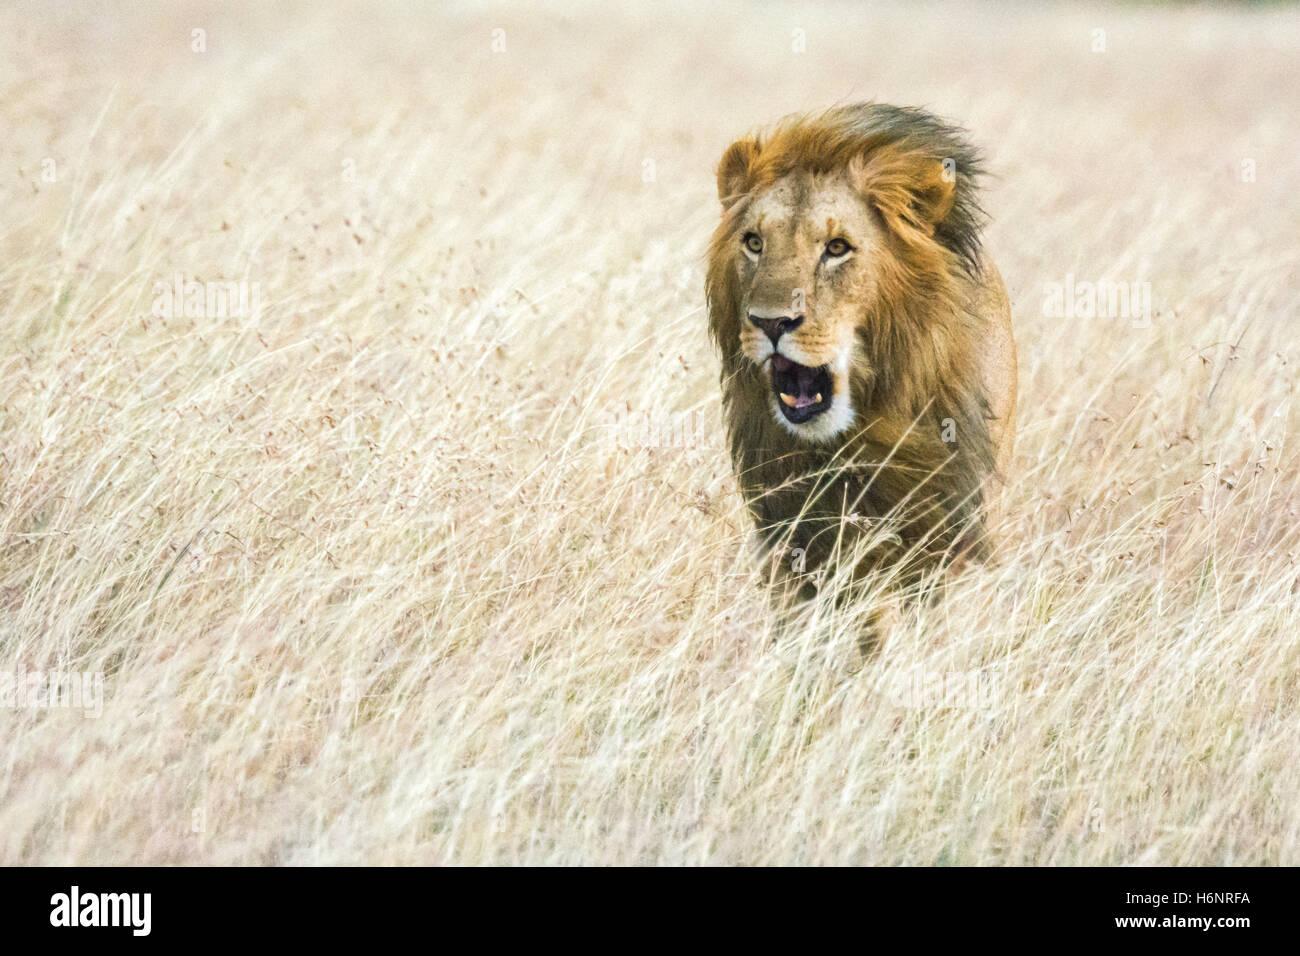 Adult Wild Male Lion, Panthera leo, walking, roaring or yawning, wind blowing mane, Masai Mara National Reserve, - Stock Image